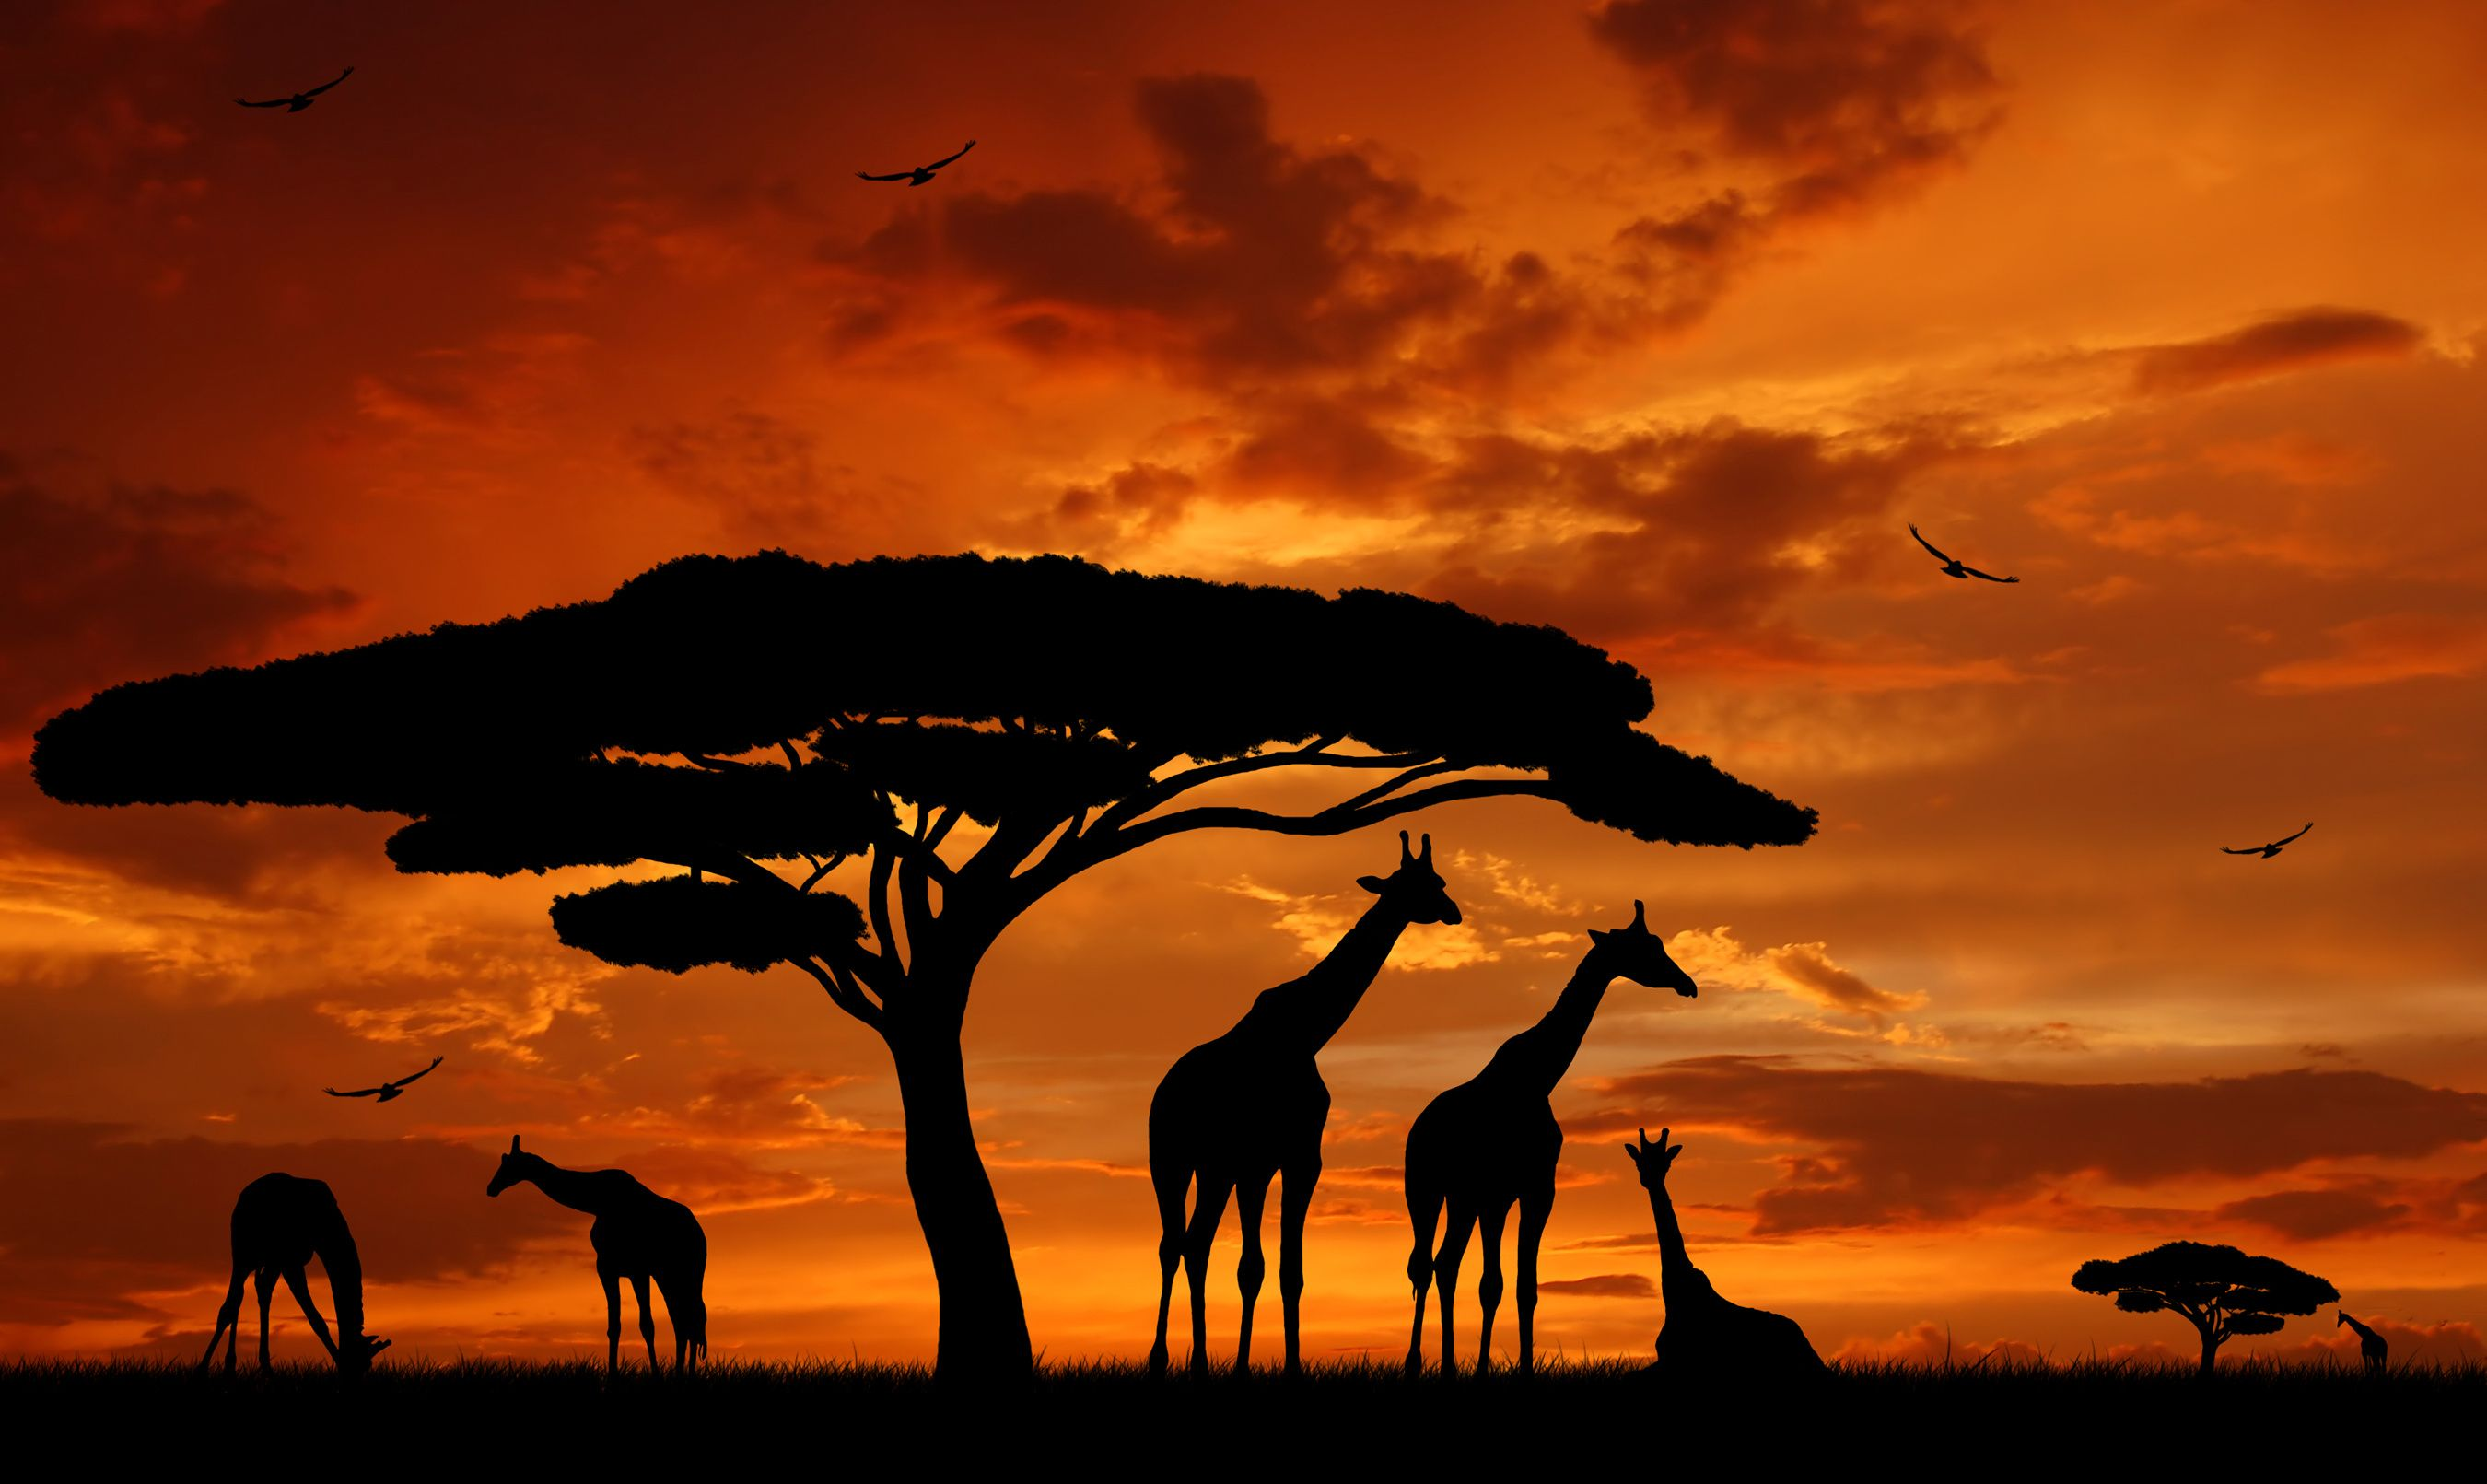 Savane afrique girafes coucher de soleil afrique - Animaux savane africaine ...